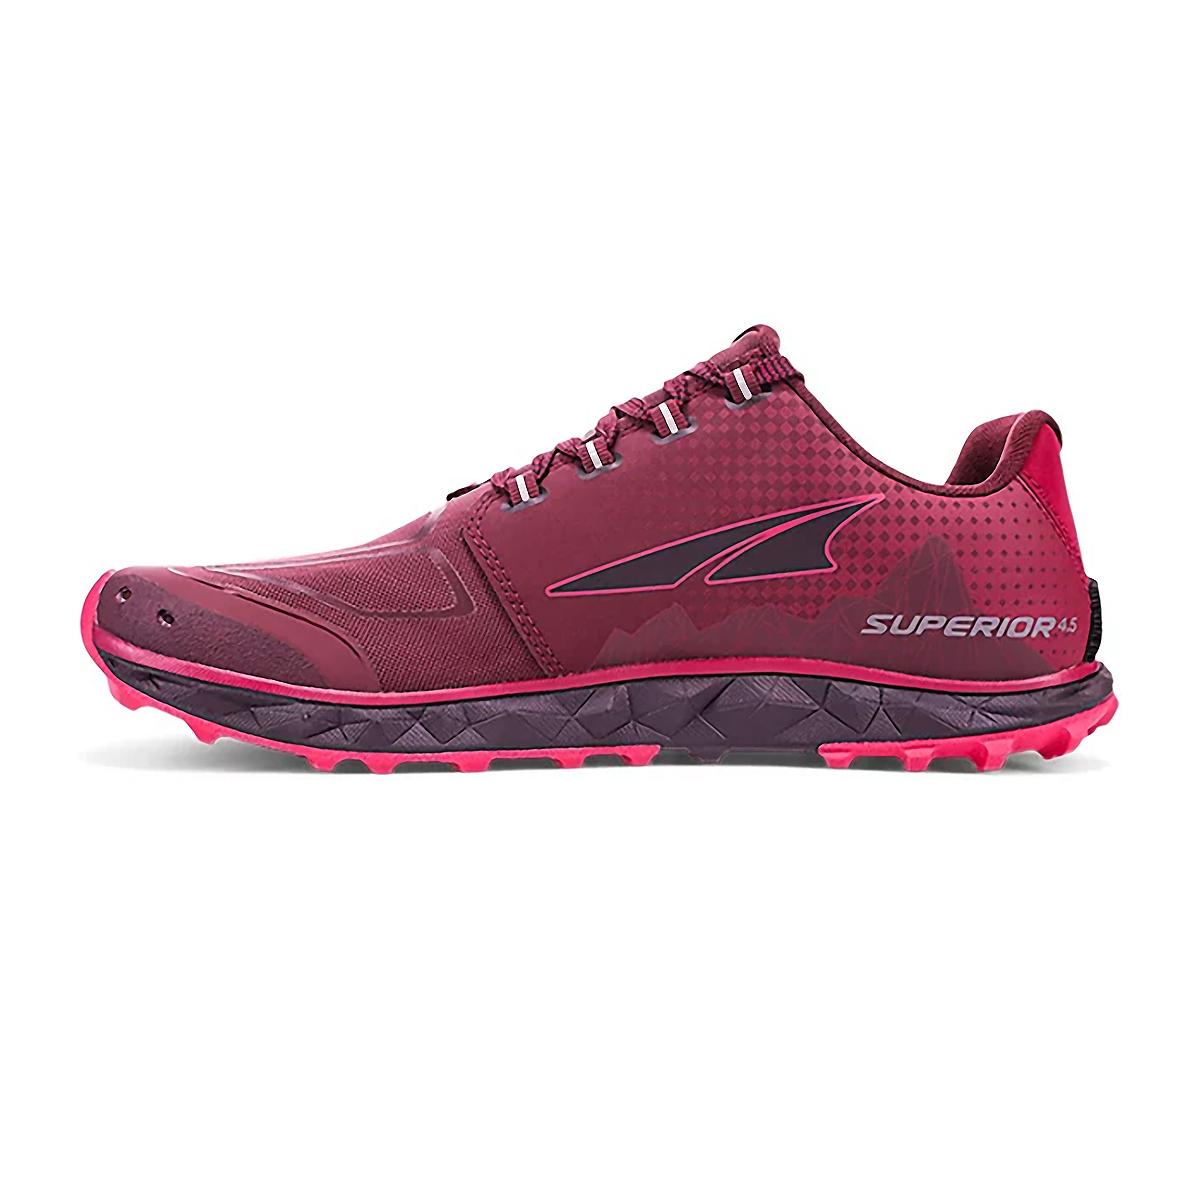 Women's Altra Superior 4.5 Trail Running Shoe - Color: Black/Pink - Size: 6 - Width: Regular, Black/Pink, large, image 2